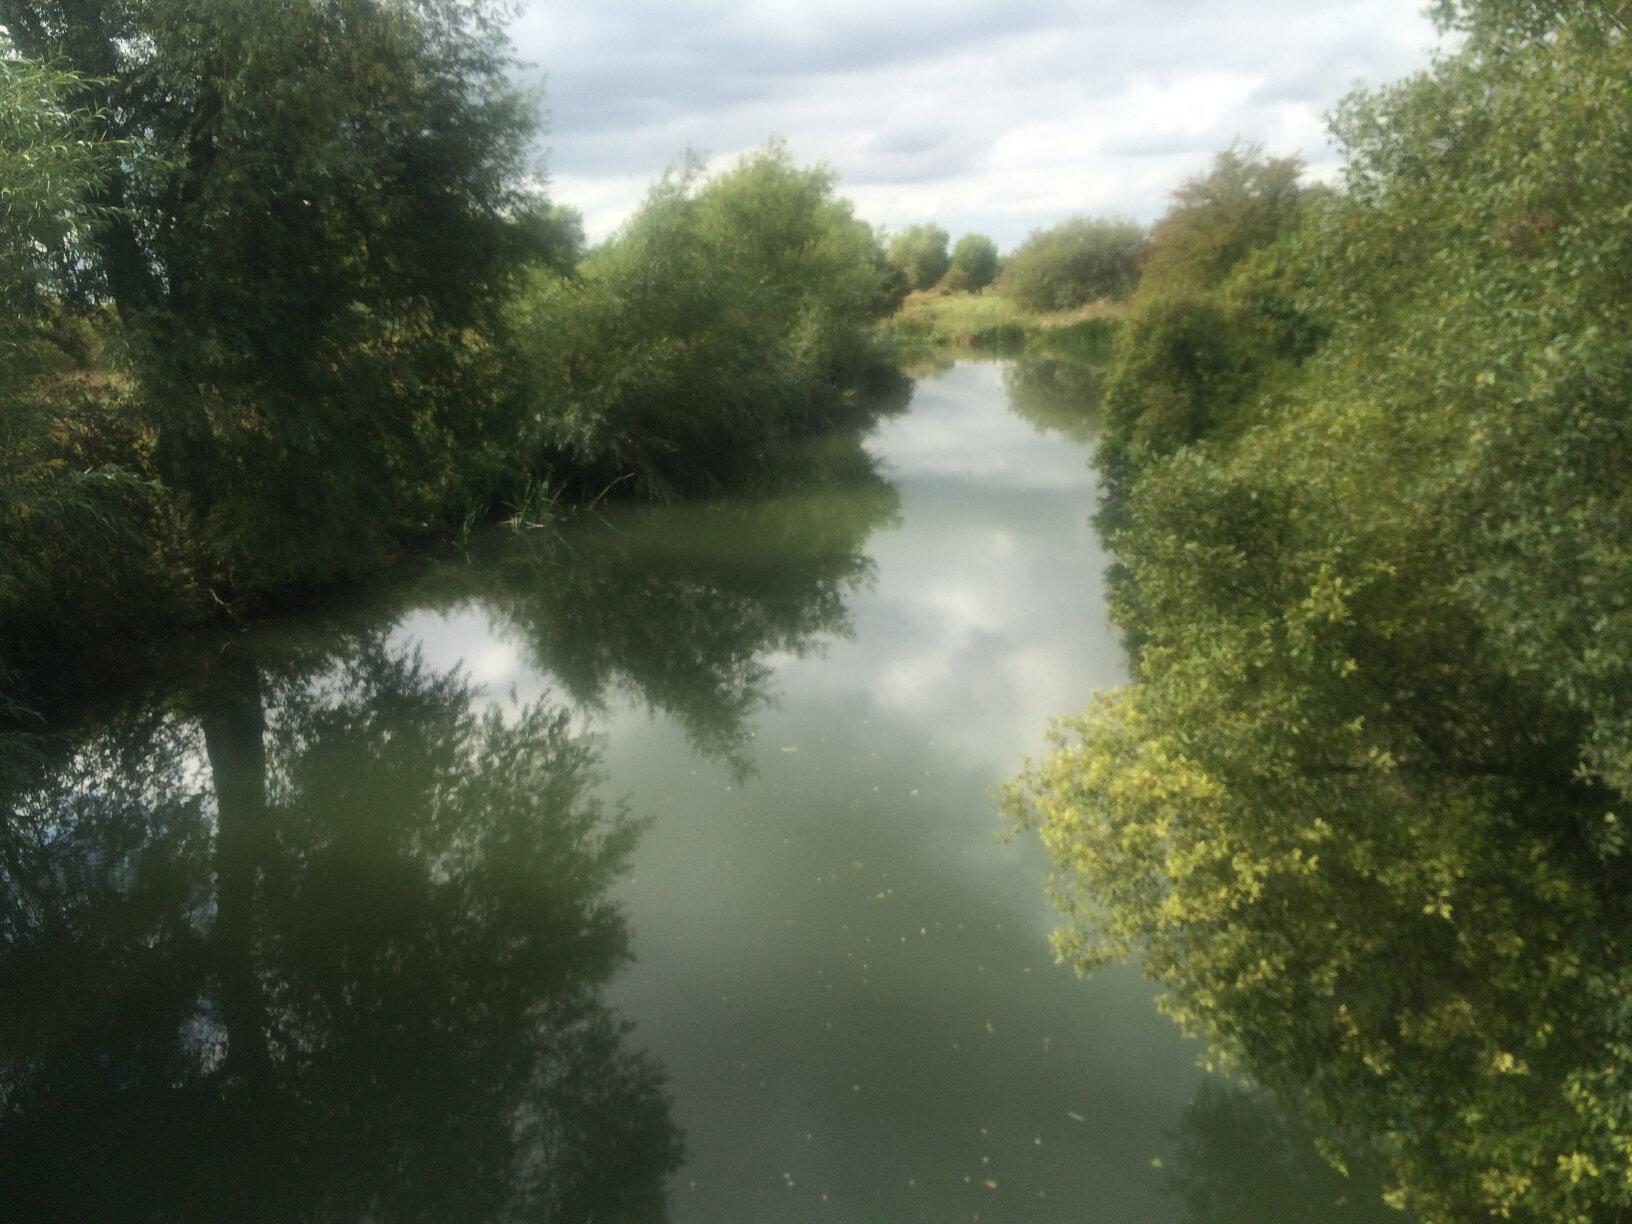 From Lechlade to Newbridge (51)